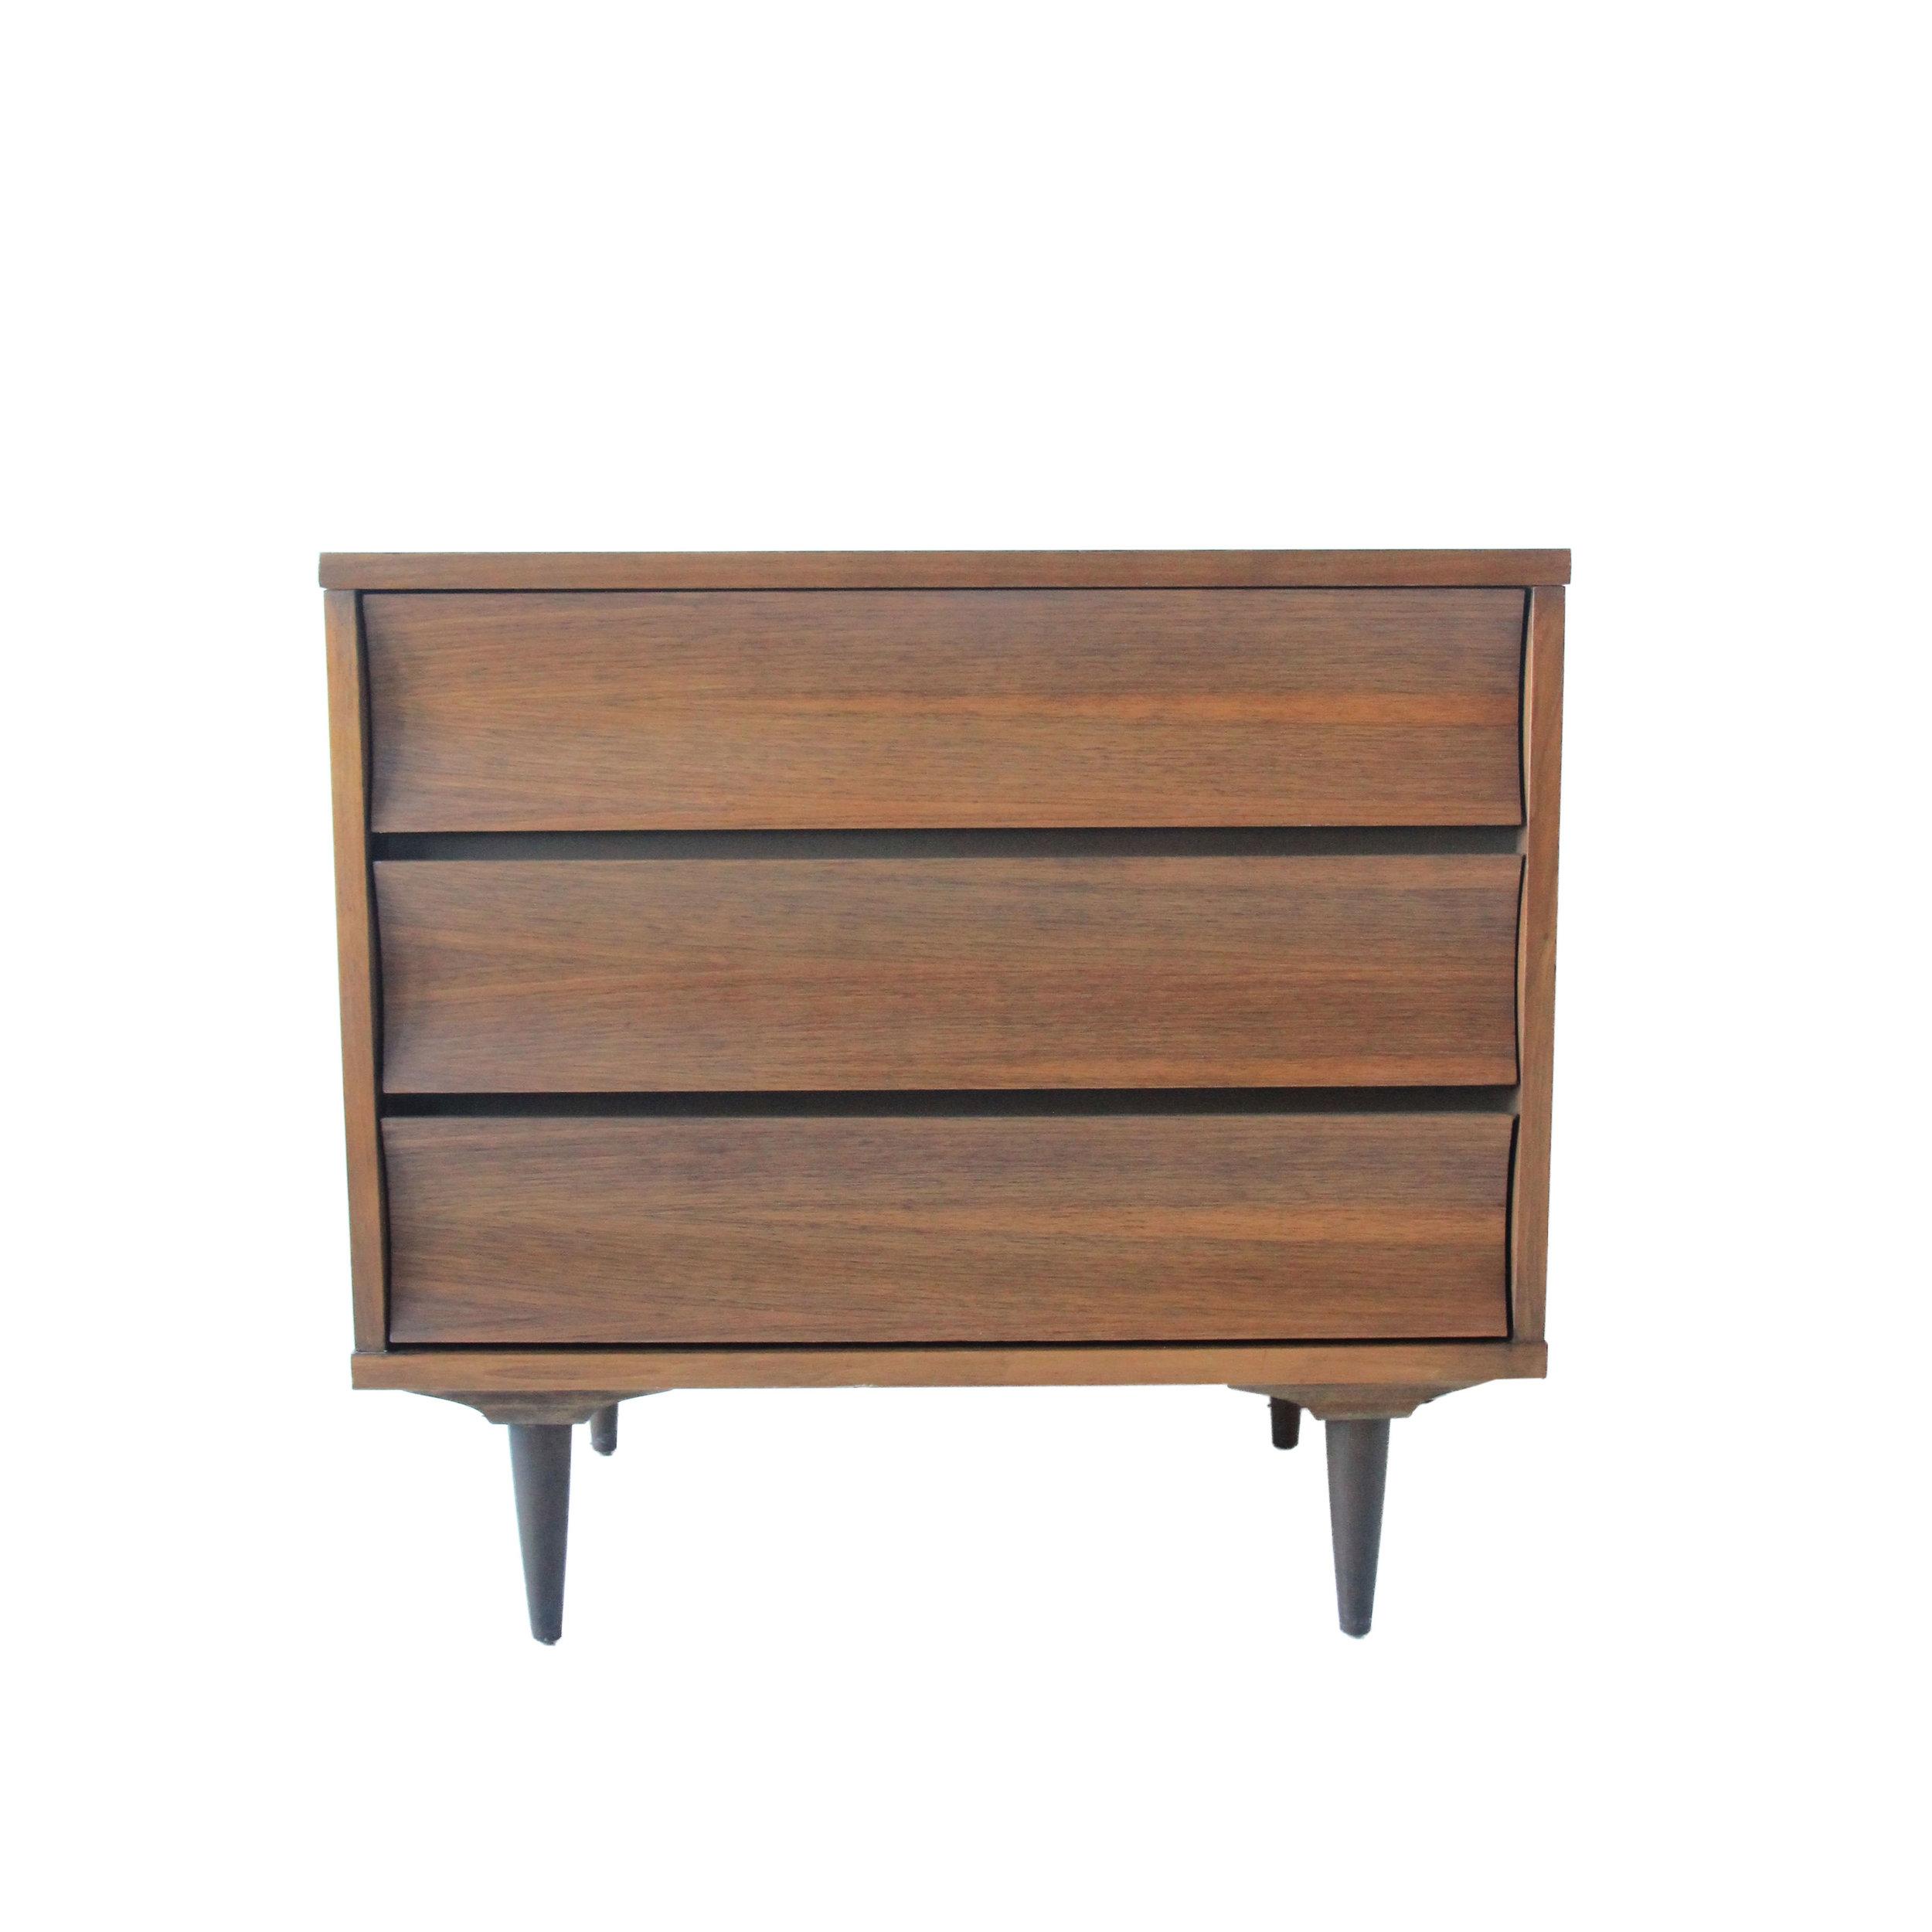 Vintage Mid Century Modern 3 Drawer Dresser by Johnson Carper